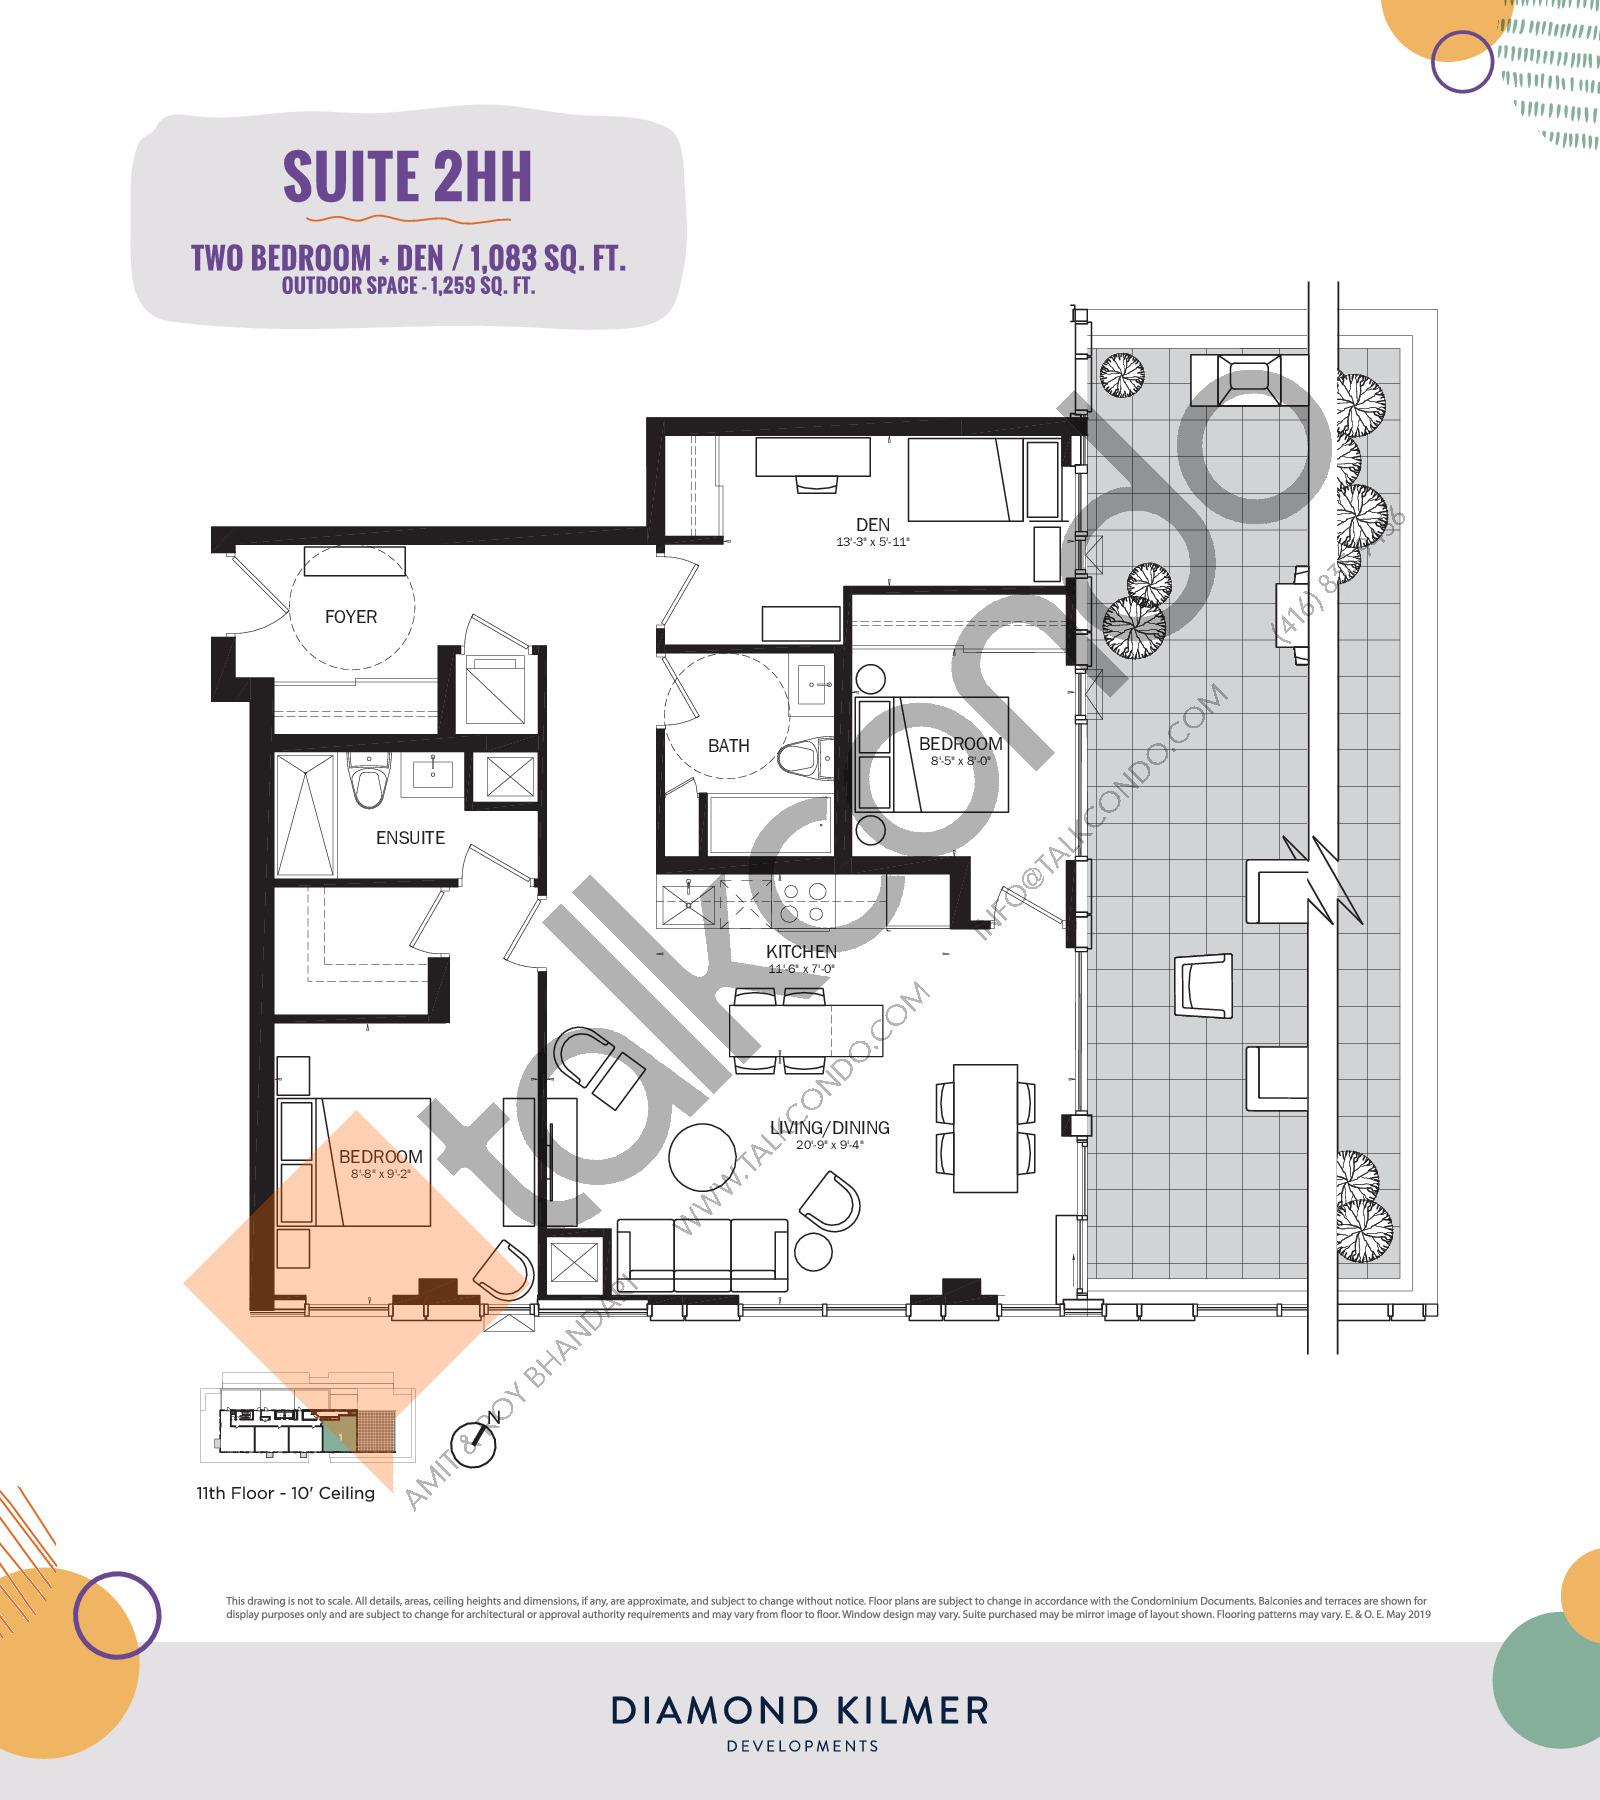 2HH Floor Plan at Reunion Crossing Condos & Urban Towns - 1083 sq.ft